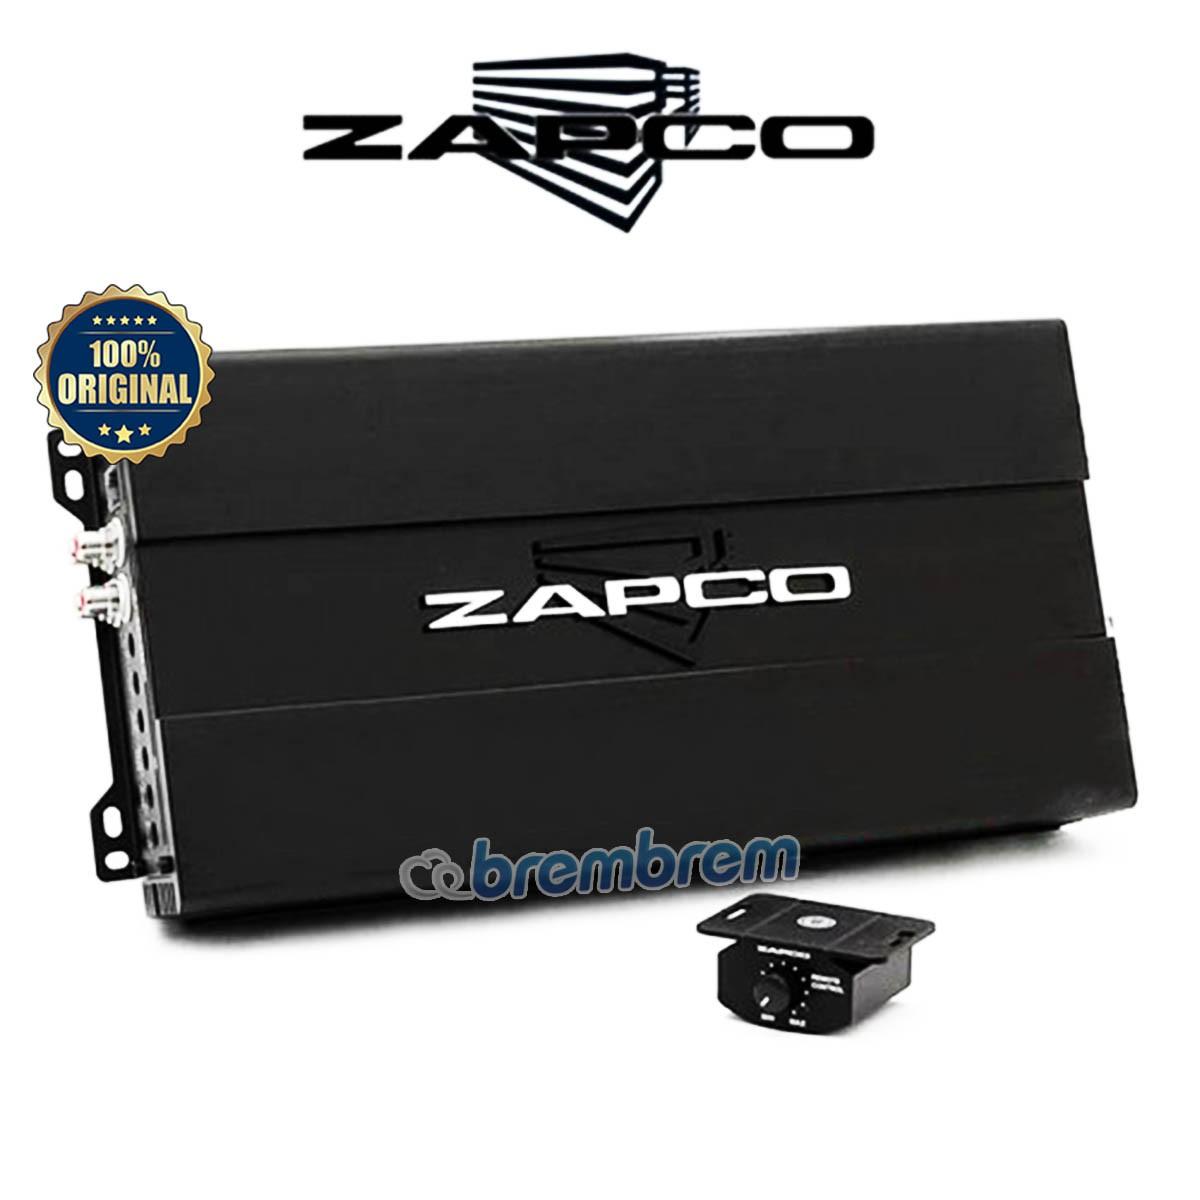 ZAPCO ST-1350XM II - POWER MONOBLOCK